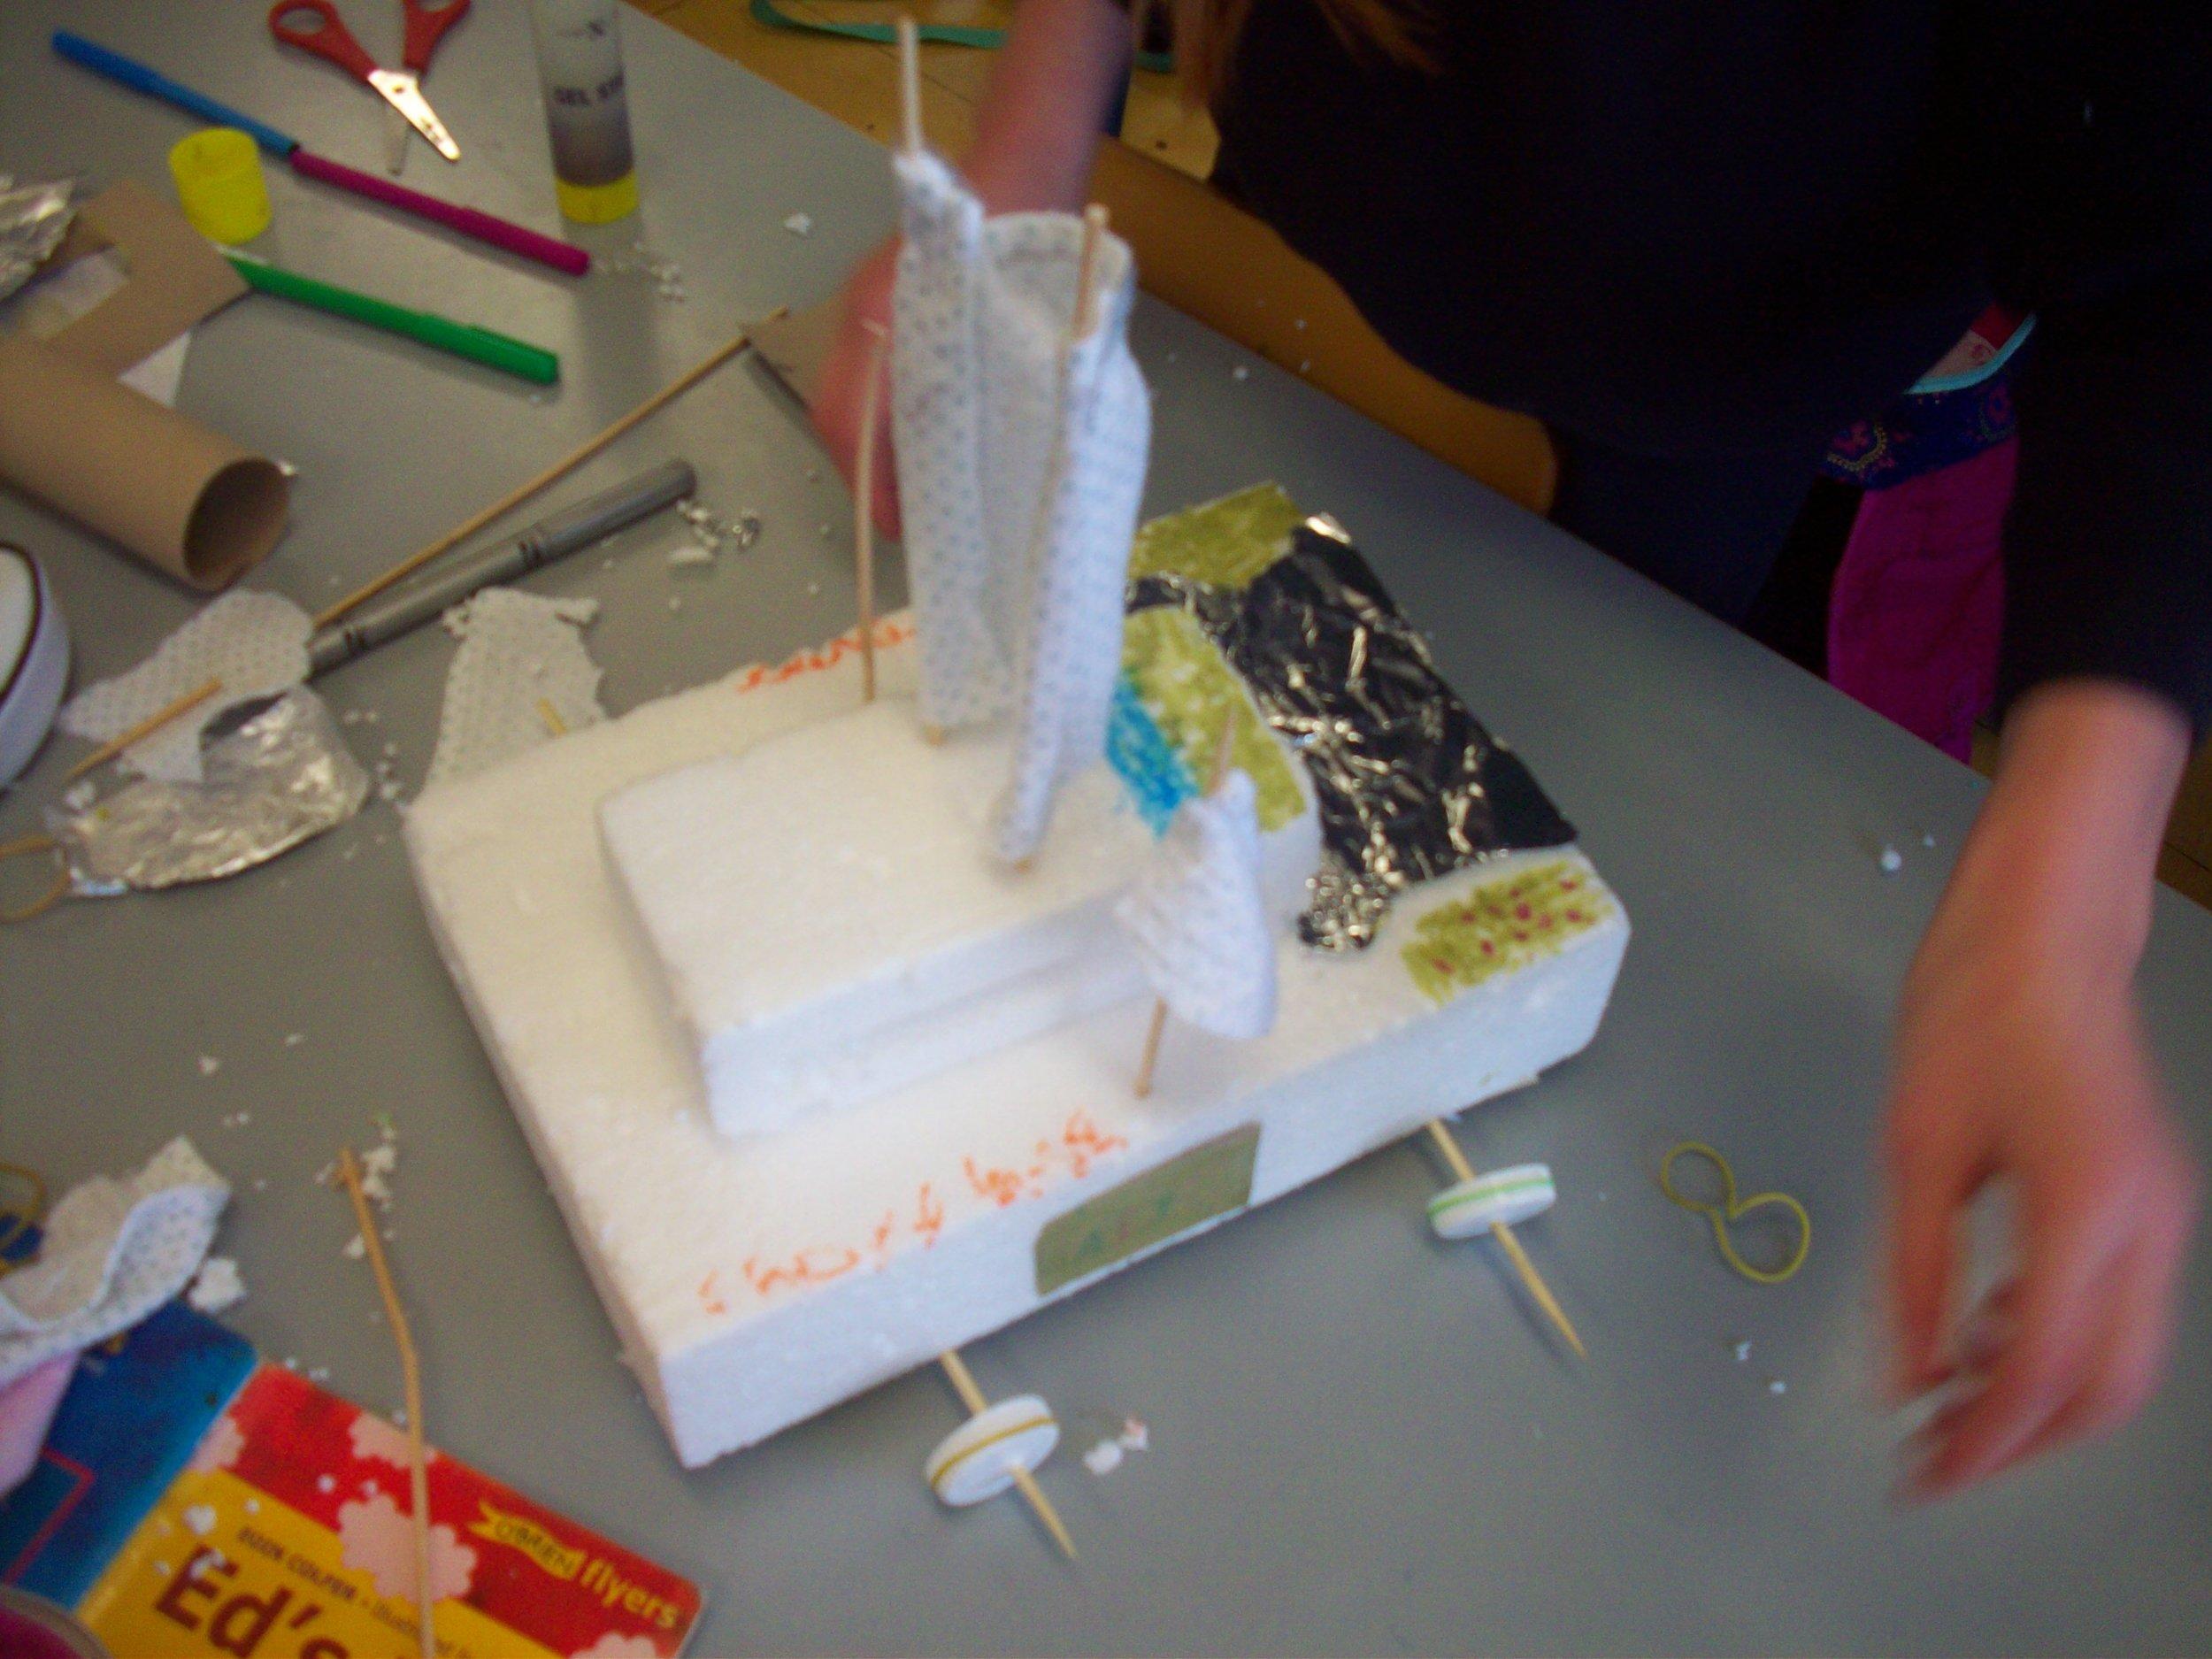 Ms. Hodnett - Science project